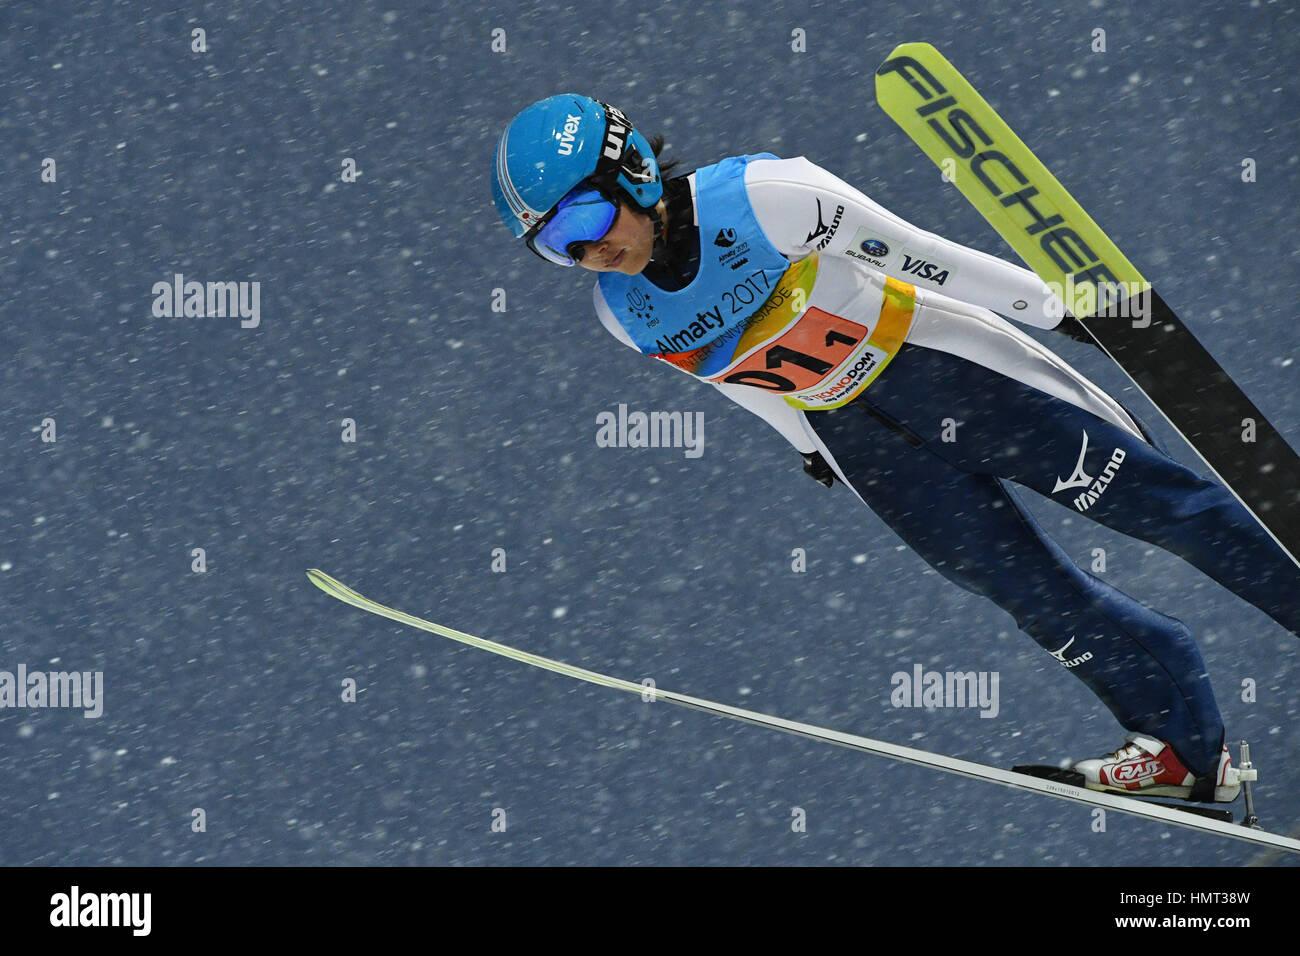 Sunkar internacional complejo de salto de esquí, Almaty, Kazajstán. 4 Feb, 2017. Jun Maruyama (JPN), 4 Imagen De Stock